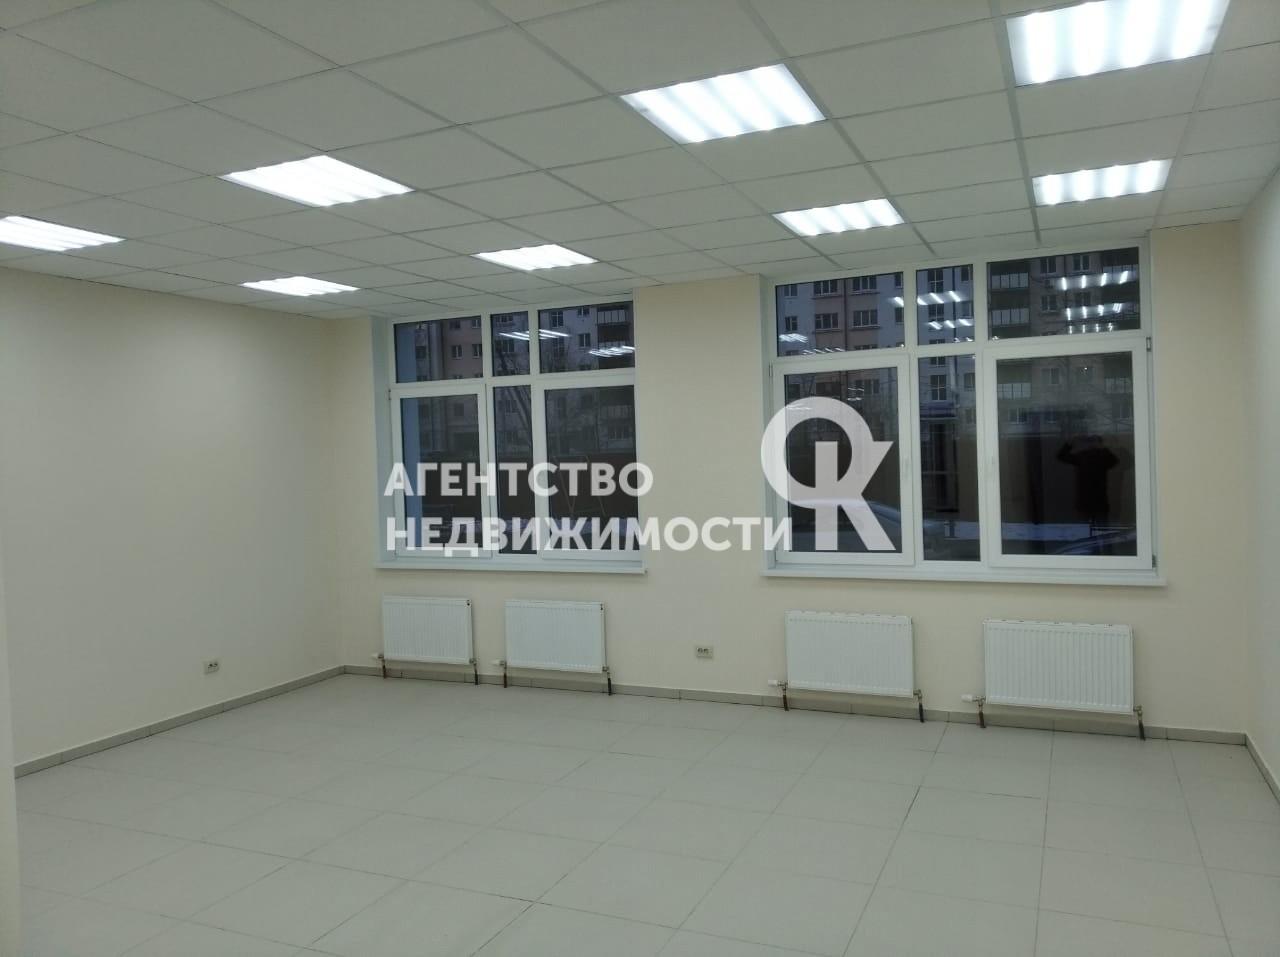 Продажа  готового бизнеса Республика Татарстан, г. Казань, Роторная ул., д.27Е